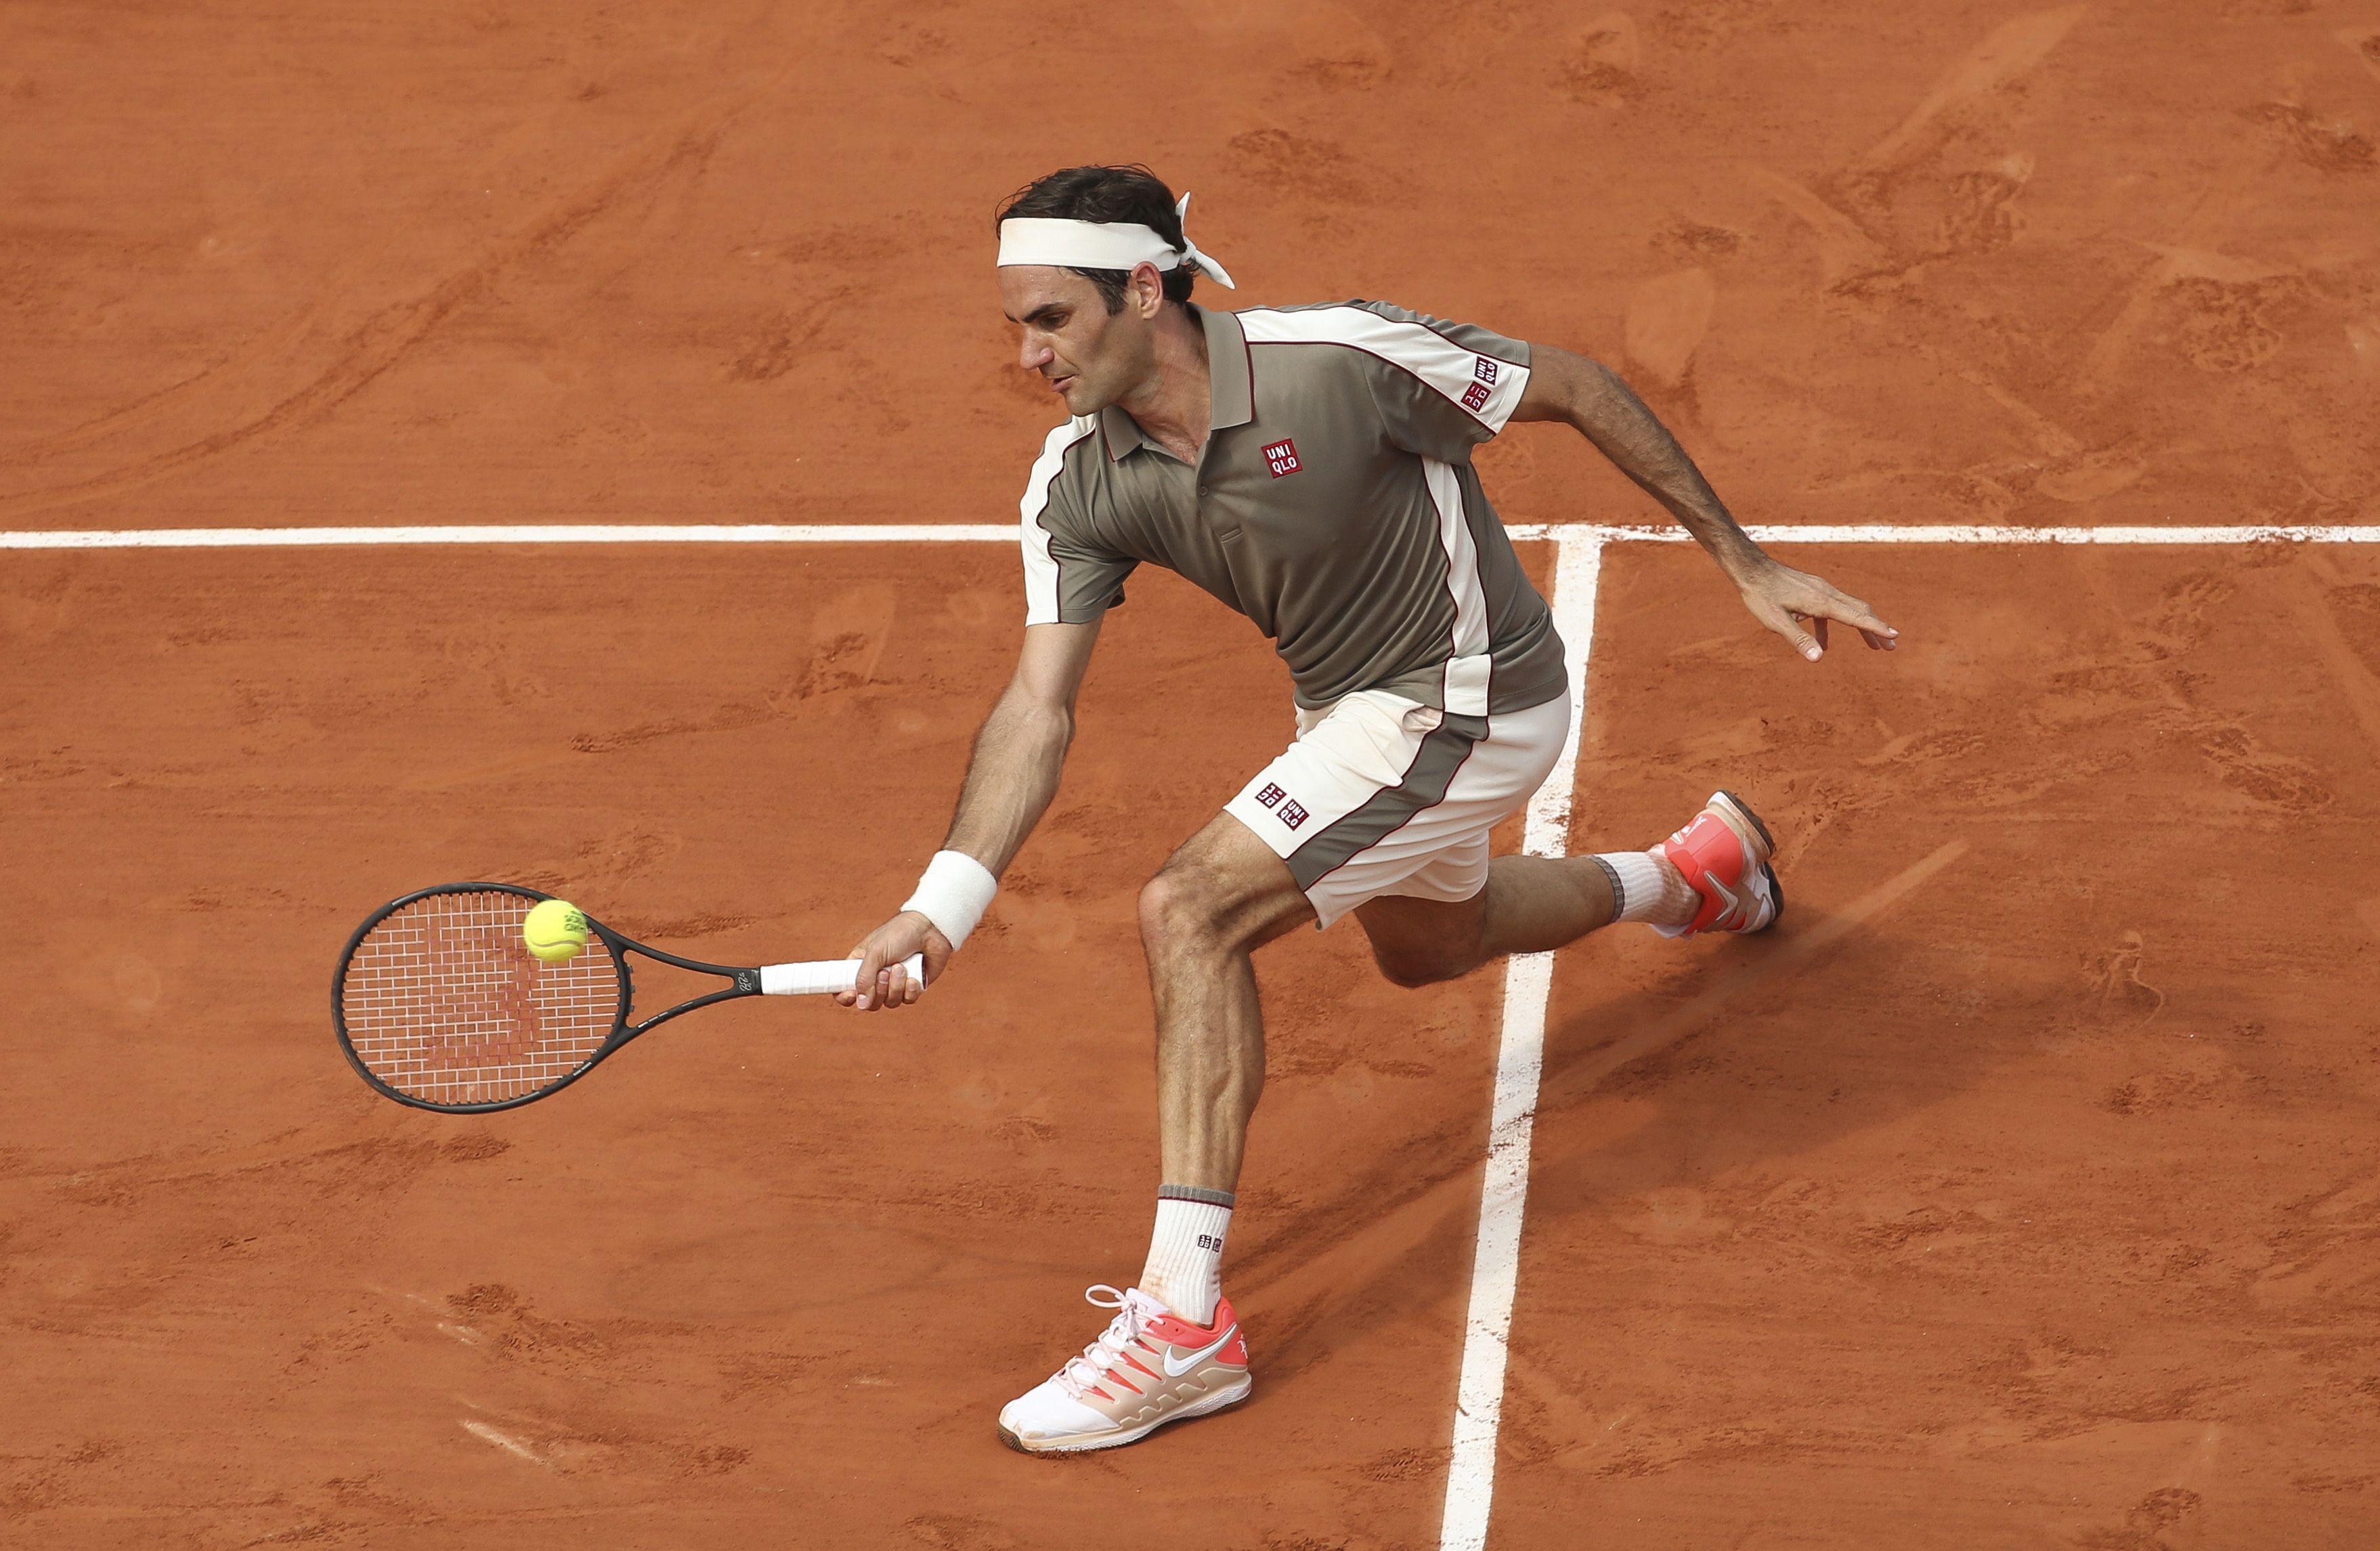 Le sneakers più belle del Roland Garros 2019 (e dove comprarle)